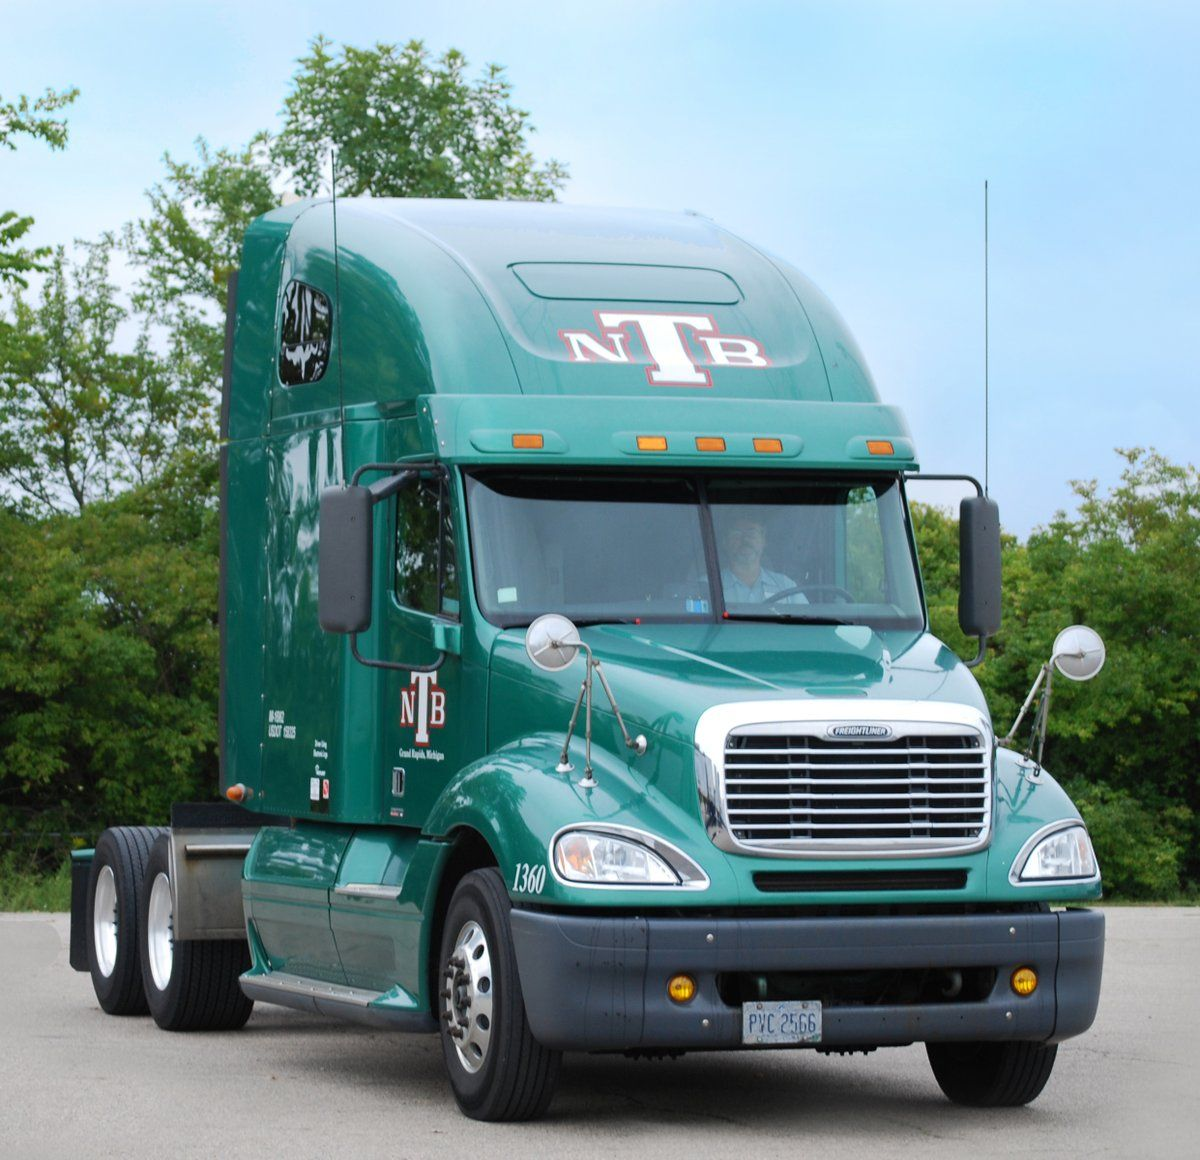 NTB Trucking (NTBTrucking) on Twitter Trucks, Heavy